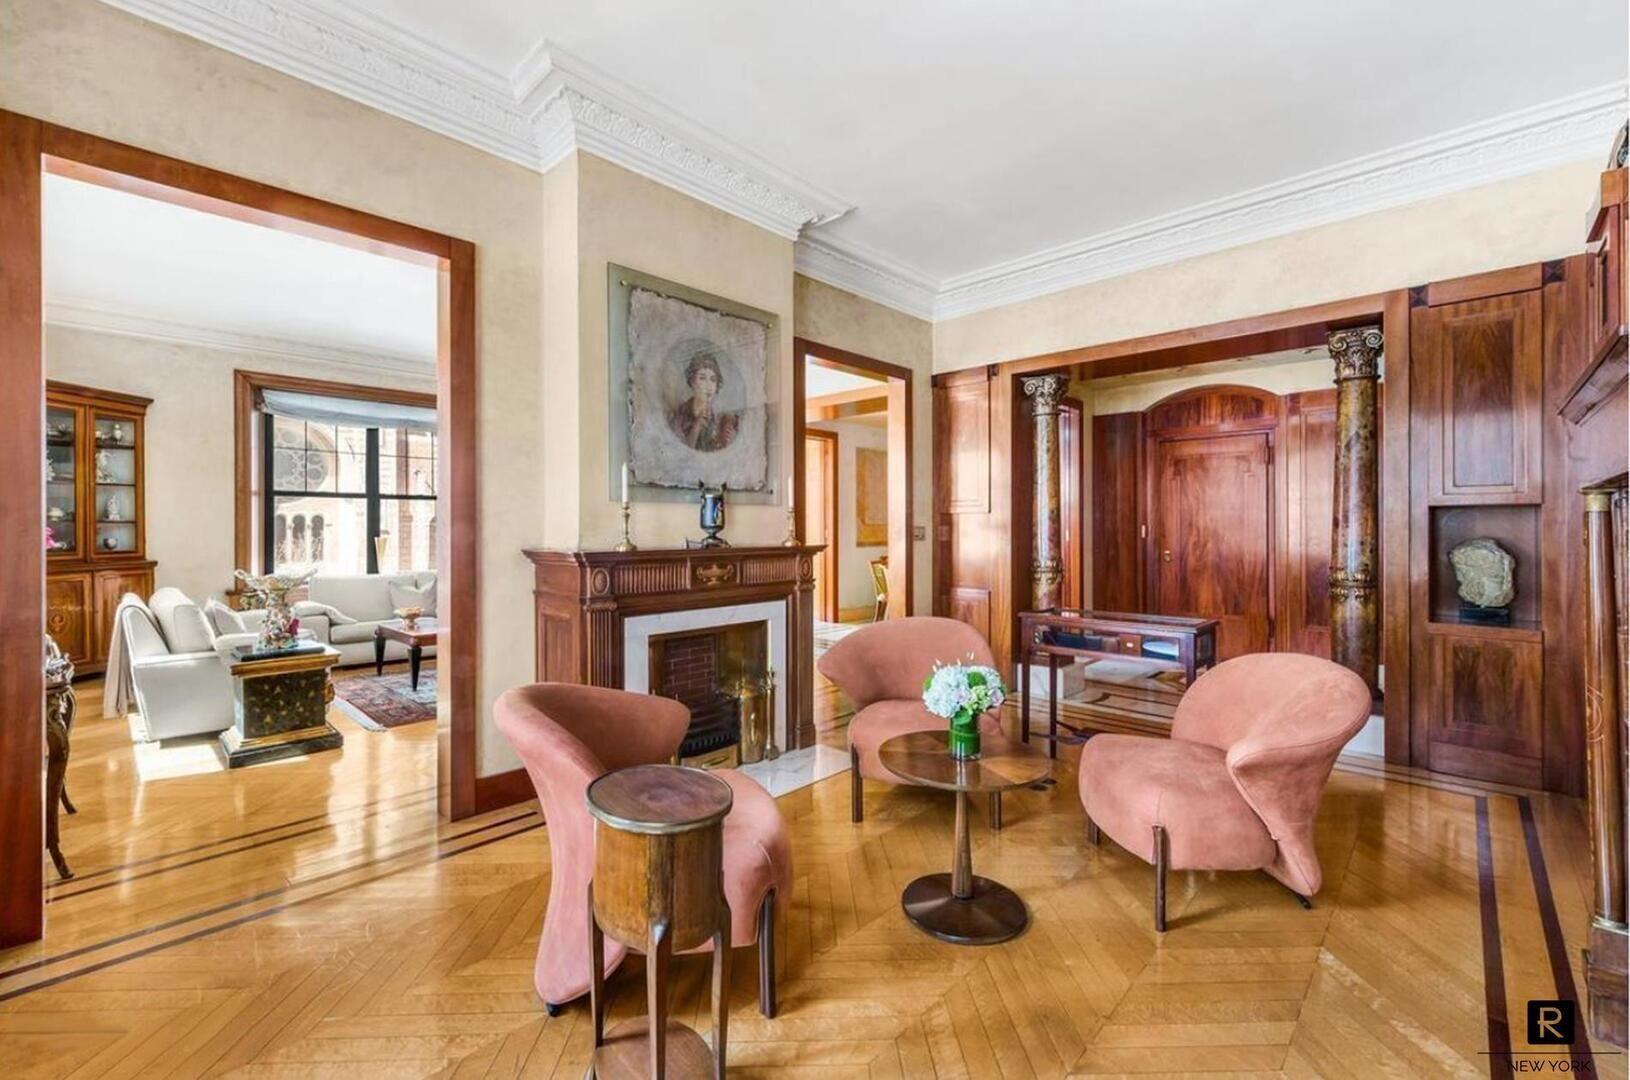 Apartment for sale at 521 Park Avenue, Apt 3-C